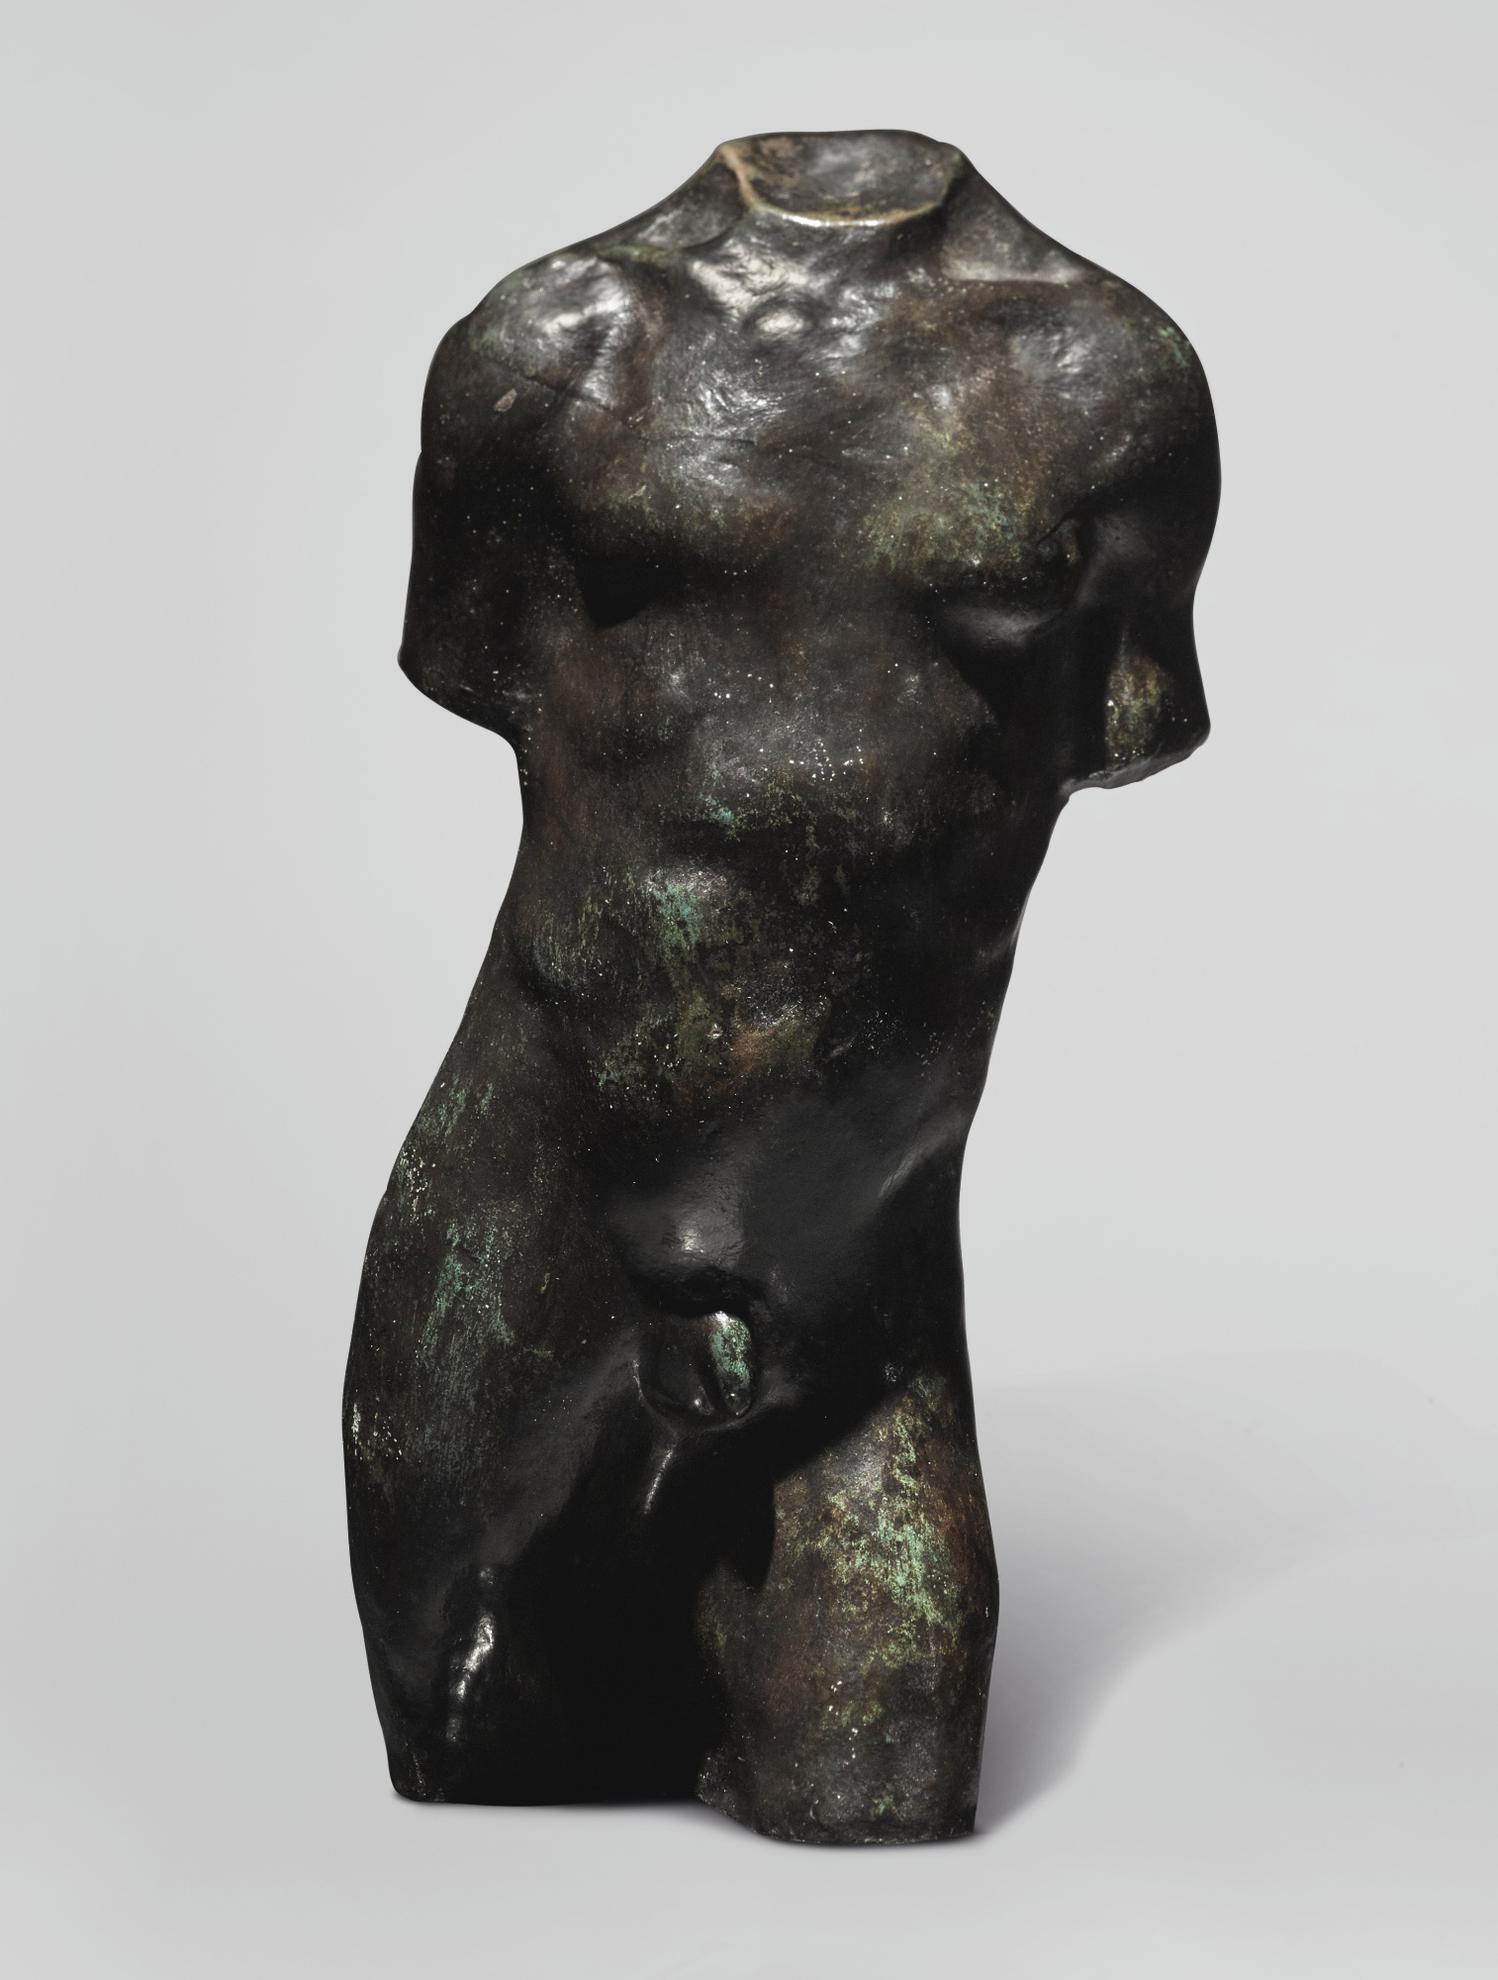 Auguste Rodin-Torse Dhomme, Etude Type A, Petit Modele-1900